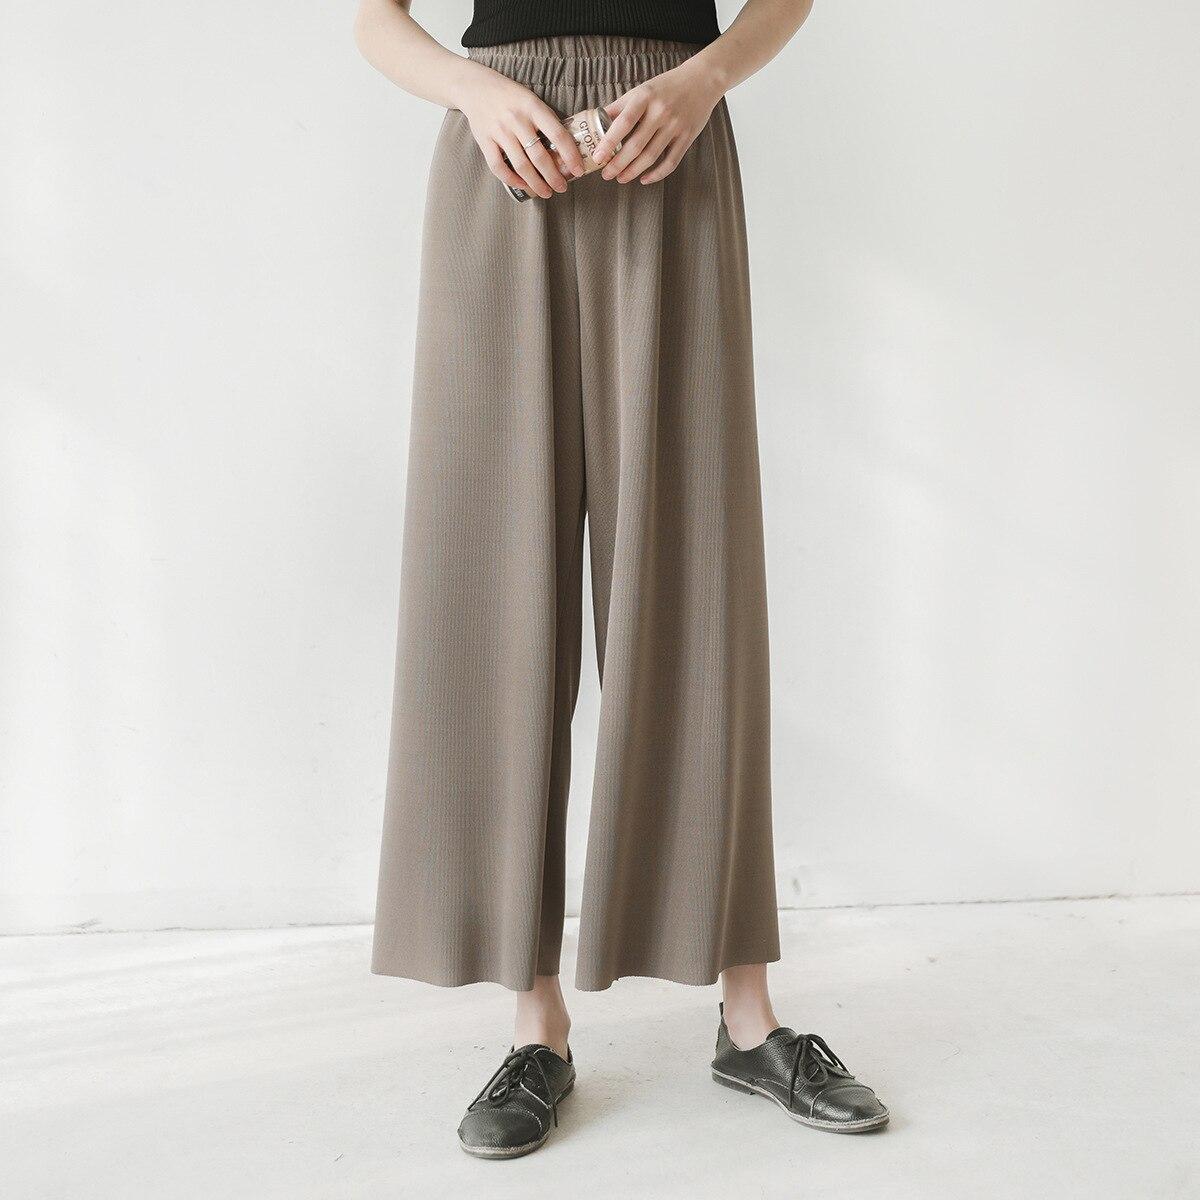 2019 New Arrival Korean Style Chic Elegant High Waist Loose   Wide     Leg     Pants   Ankle-length Slacks For Women Free Shipping